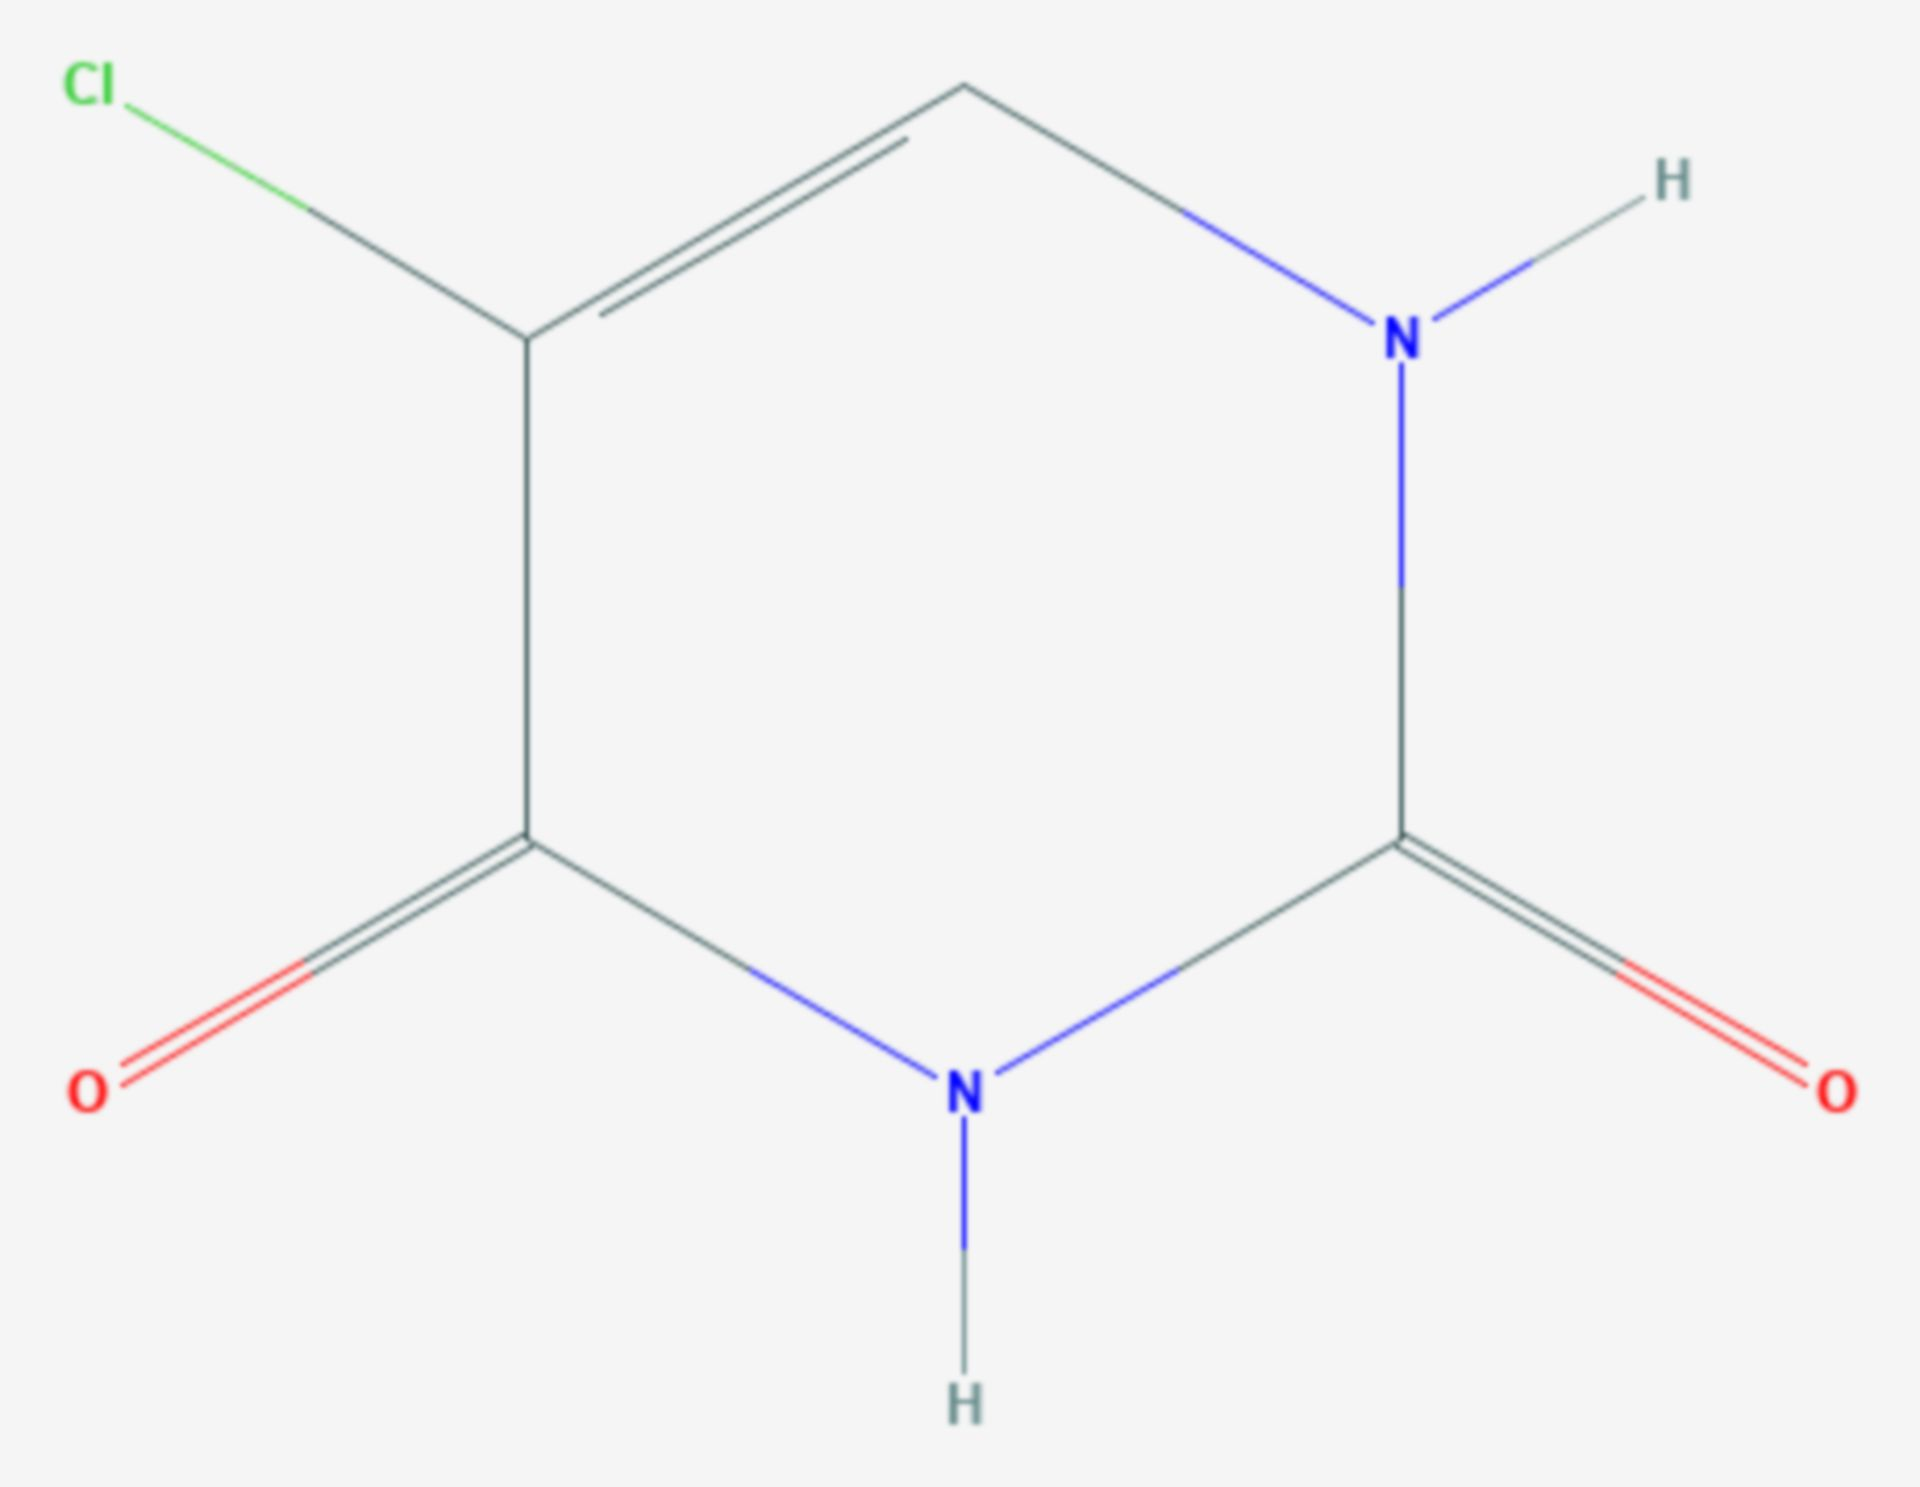 5-Chloruracil (Strukturformel)